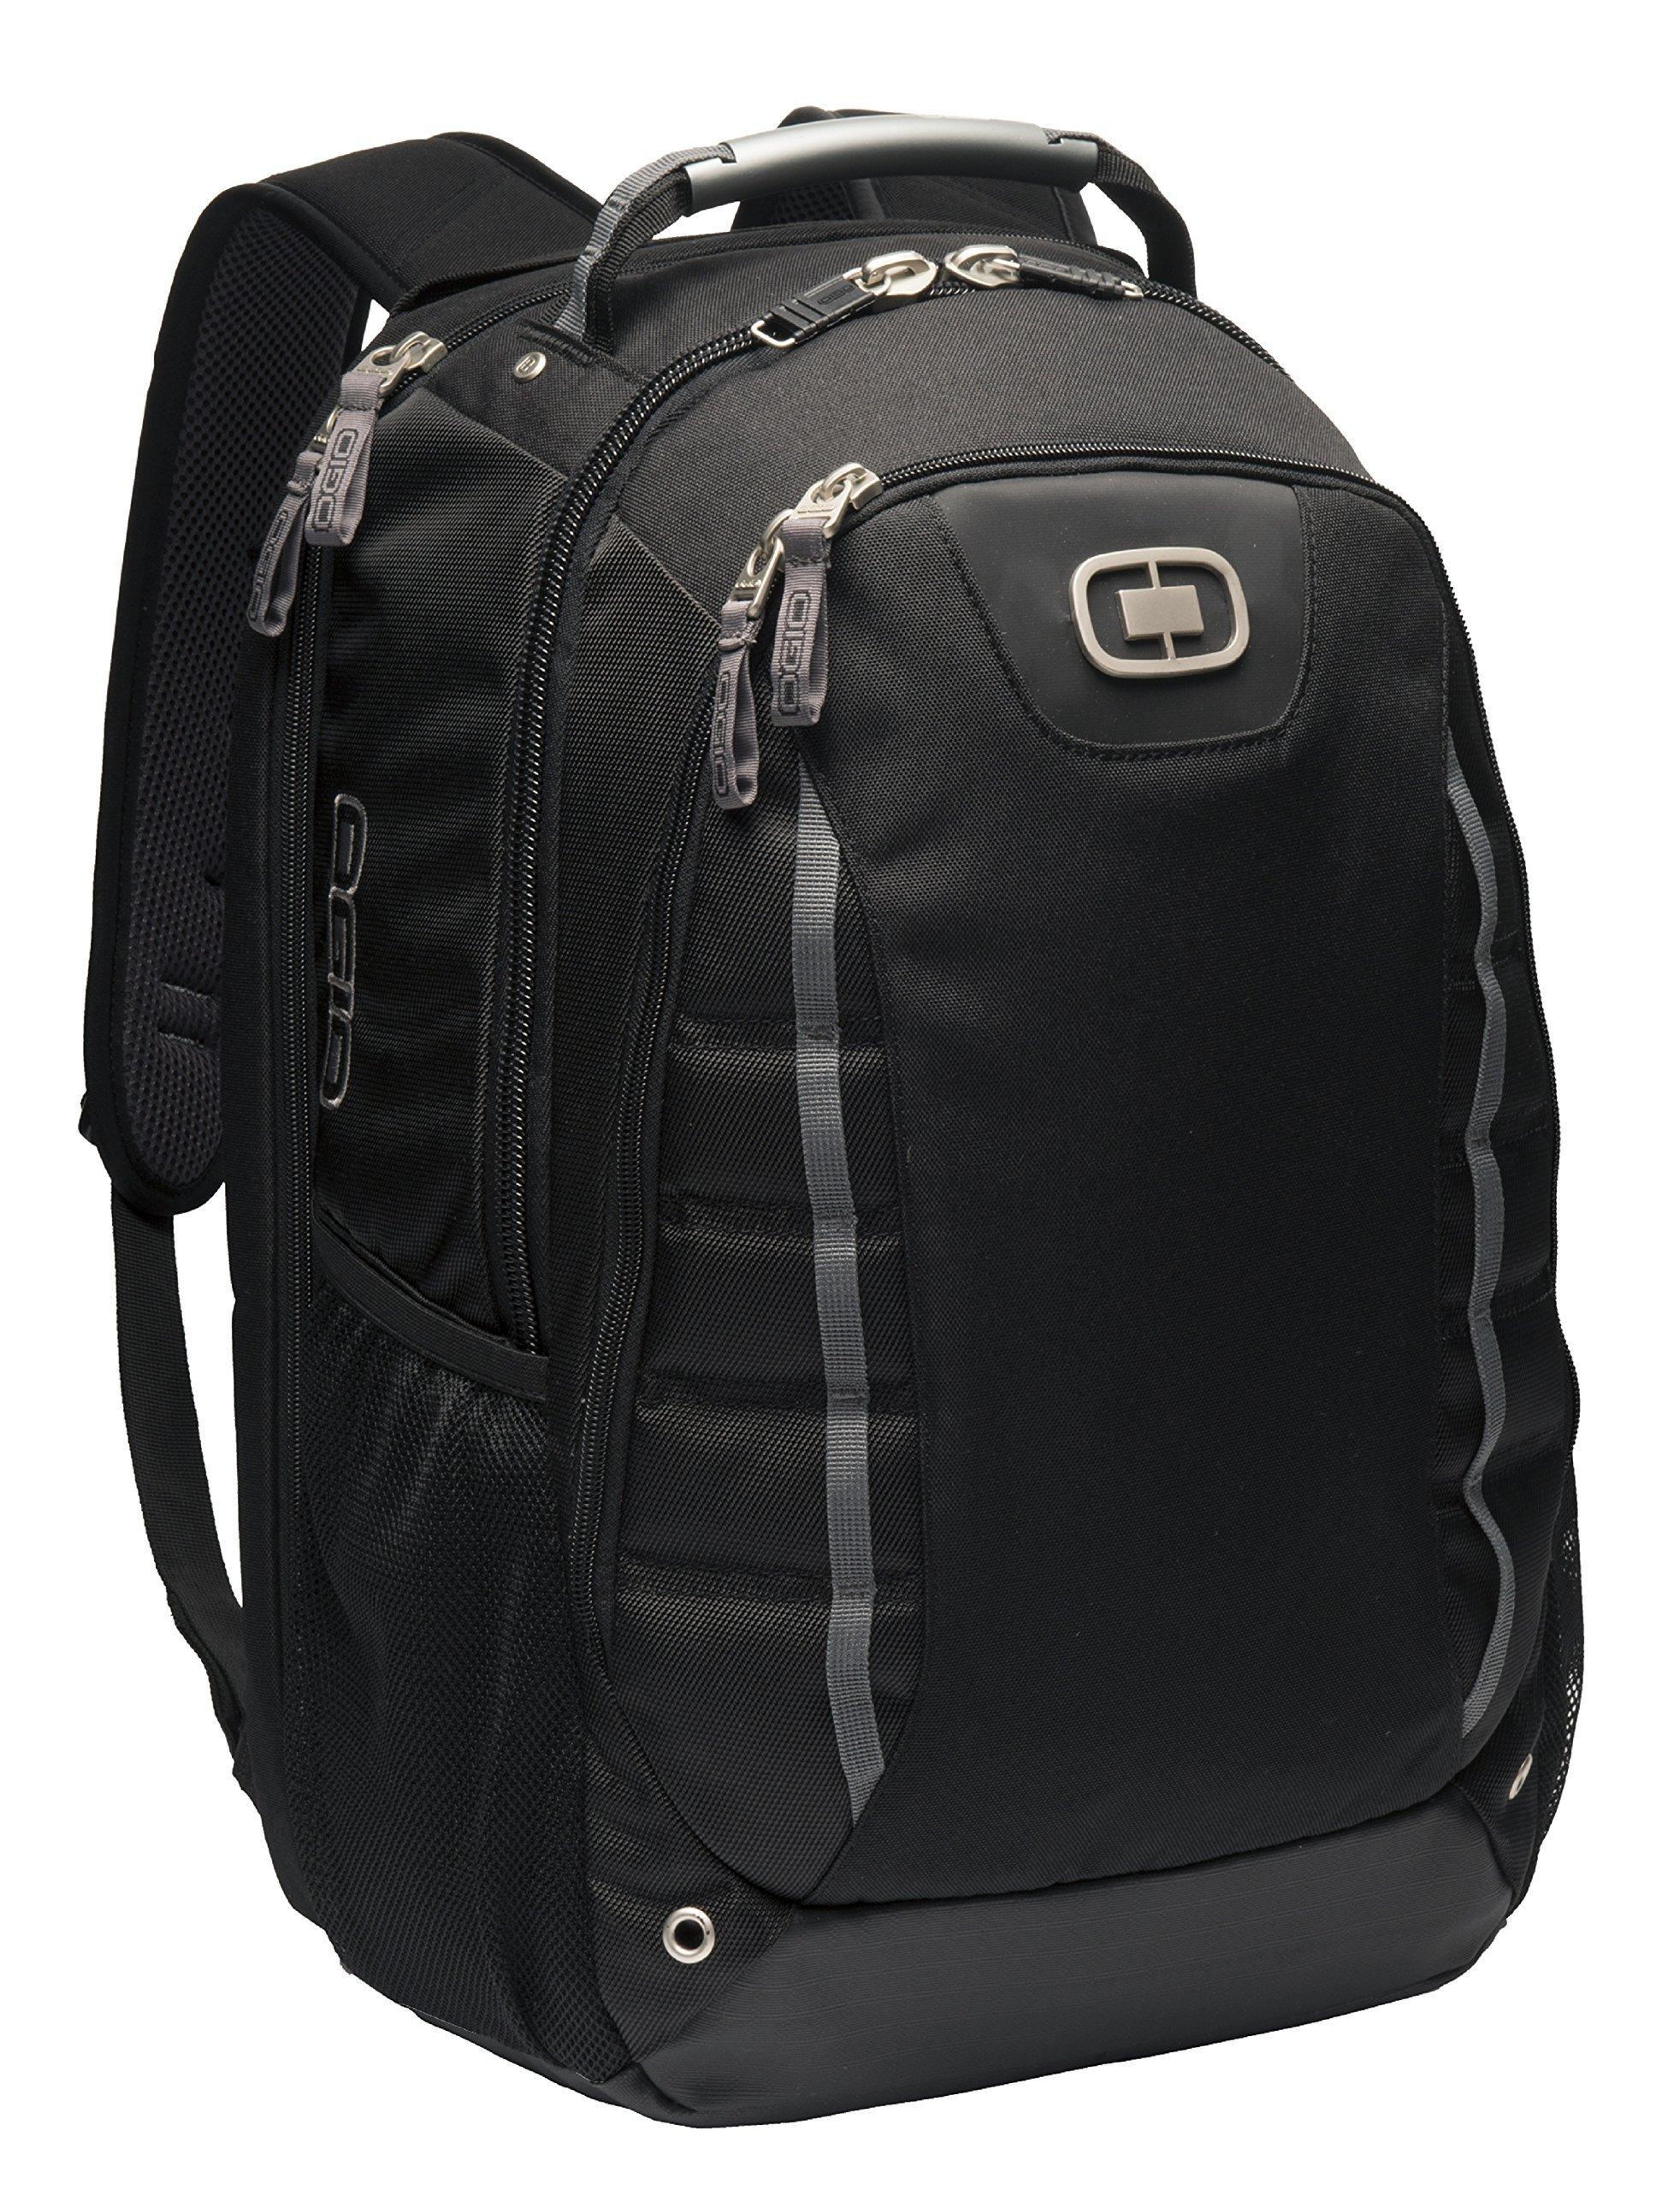 Ogio 417054 Pursuit Pack 17'' Laptop/MacBook Pro Backpack, Black